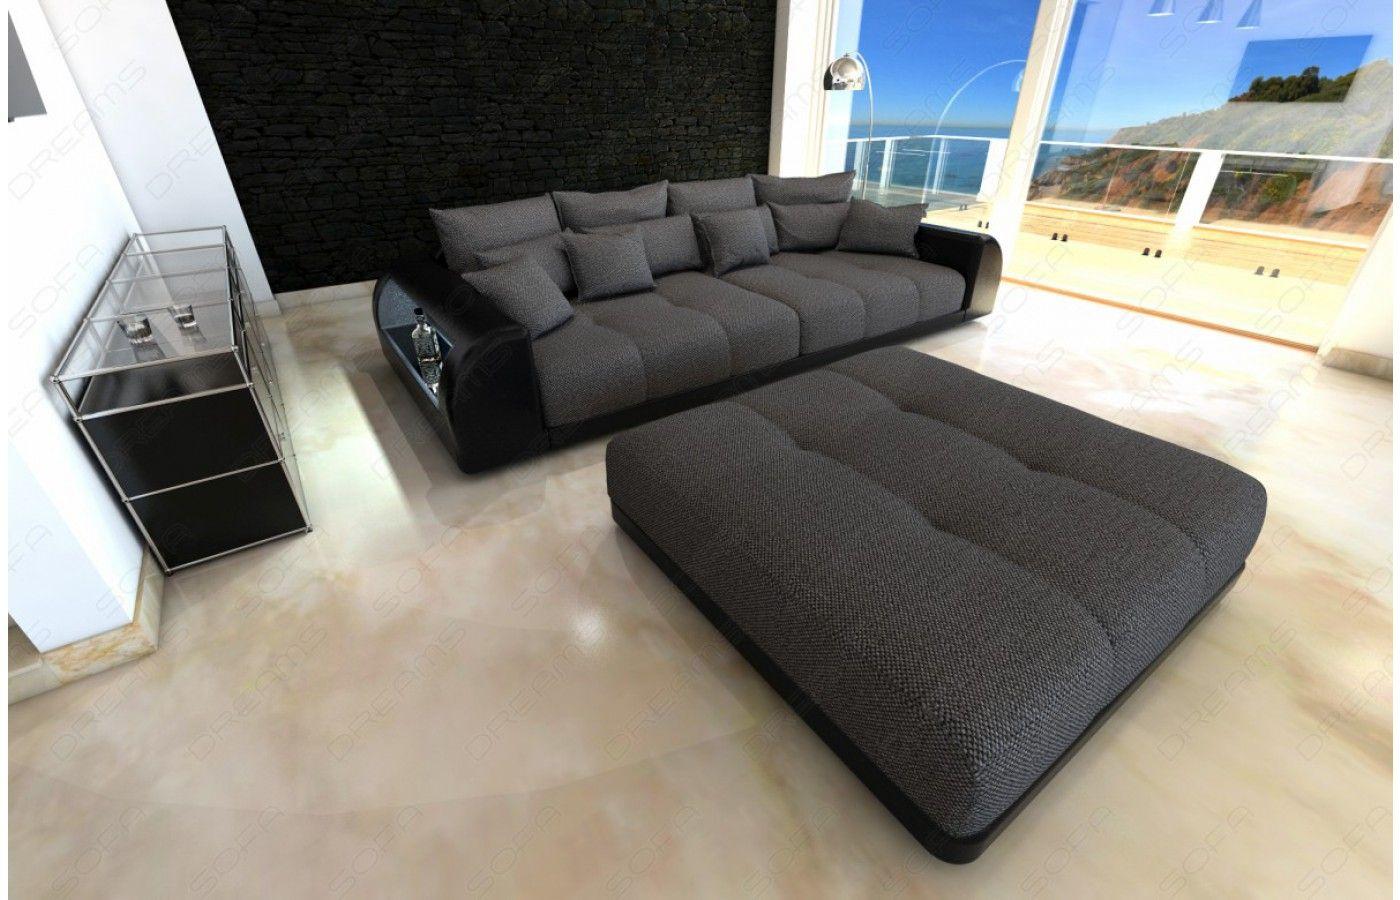 ecksofa mit led beleuchtung free kostenlose lieferung w. Black Bedroom Furniture Sets. Home Design Ideas